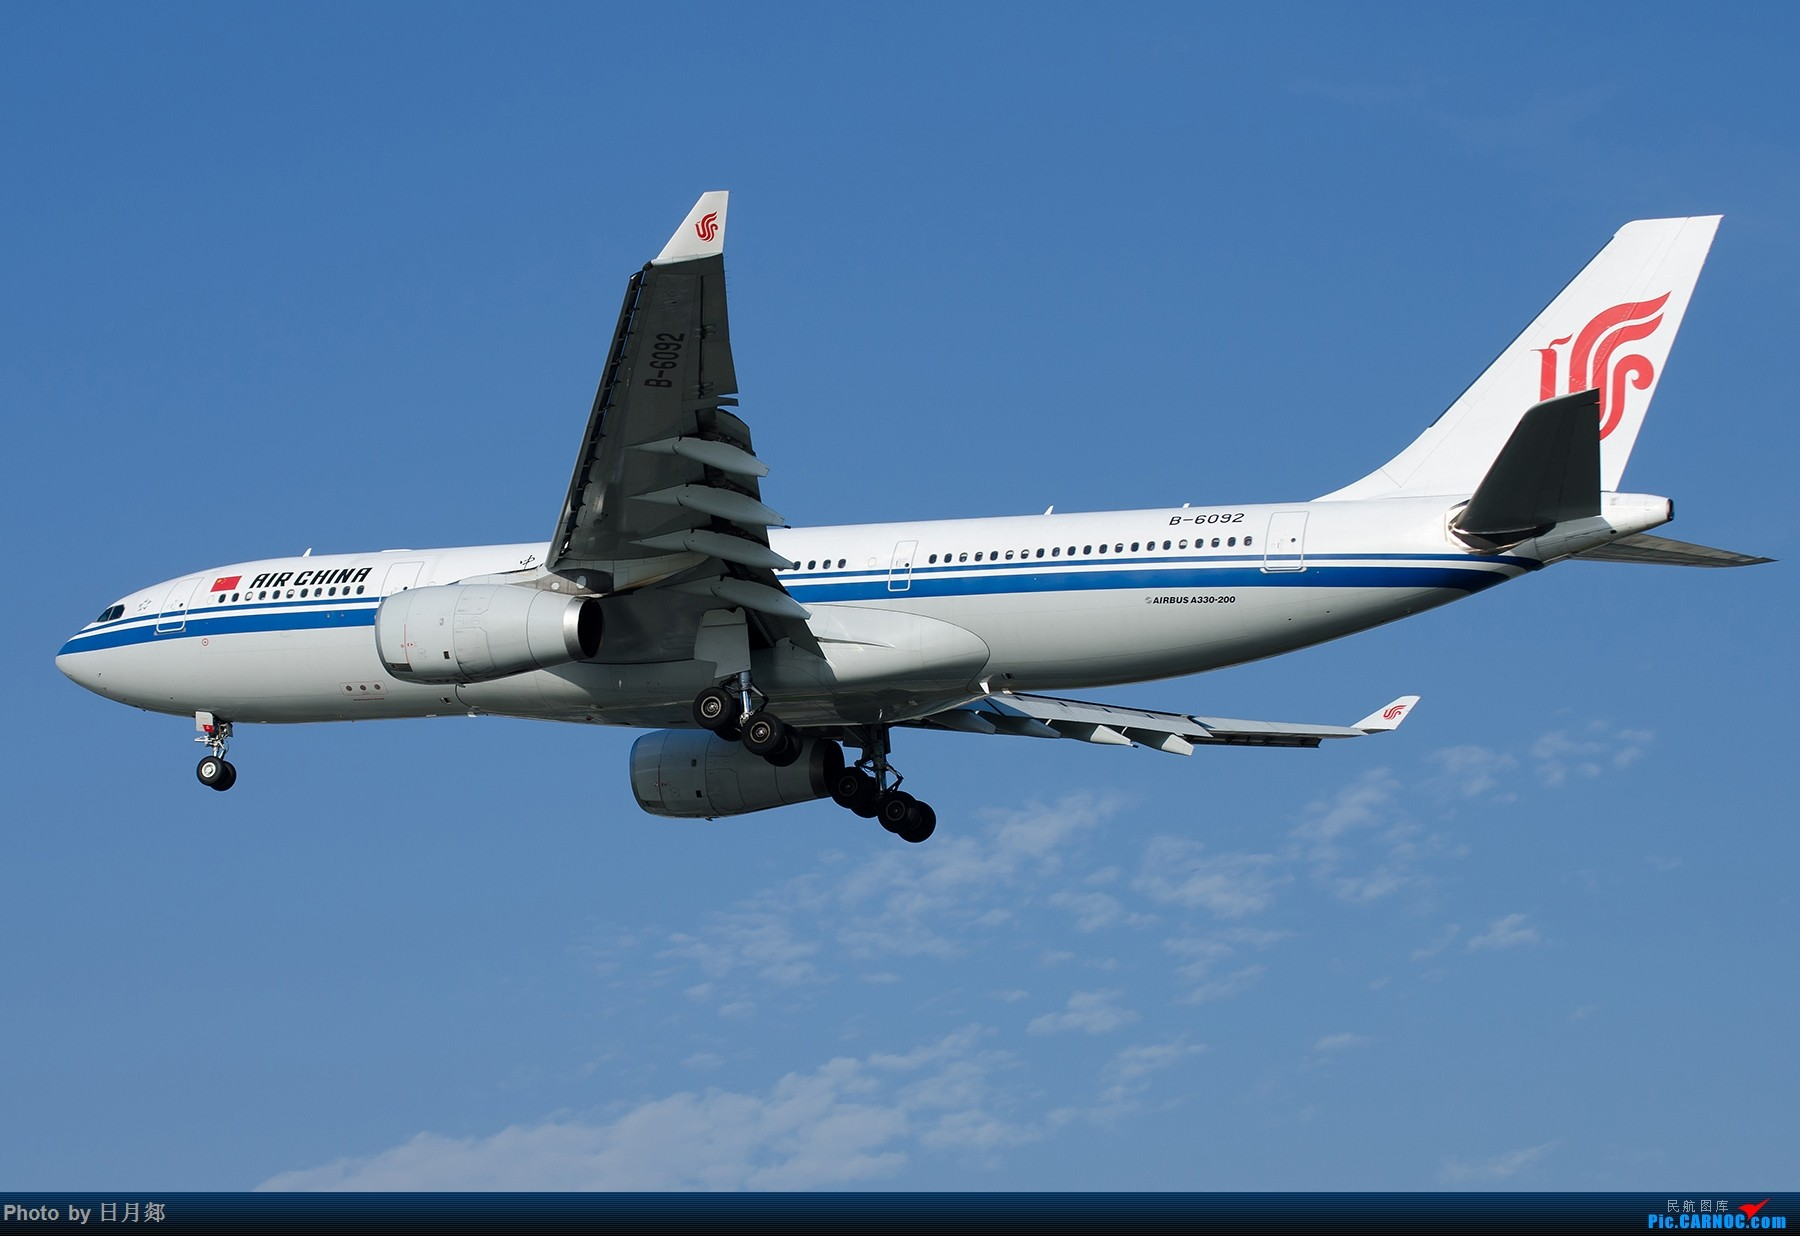 Re:[原创]【SHA拍机*1800大图】轻度污染来临前宝贵的蓝天,且拍且珍惜 AIRBUS A330-200 B-6092 中国上海虹桥国际机场